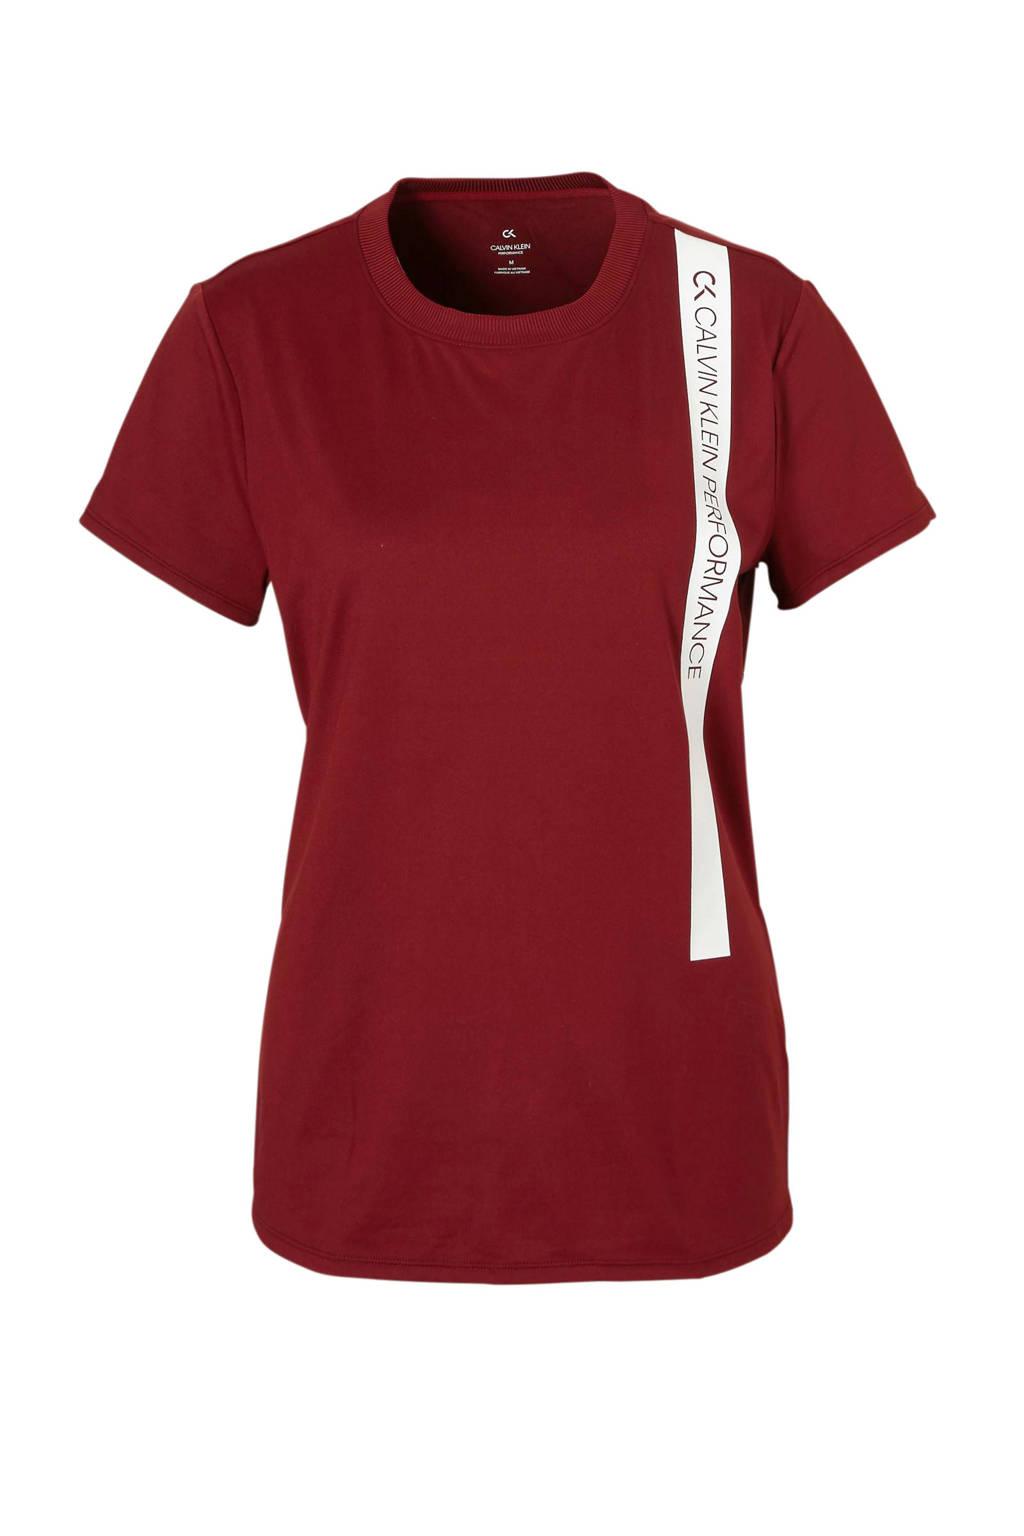 Calvin Klein Performance sport T-shirt bordeauxrood, Bordeauxrood/wit/blauw